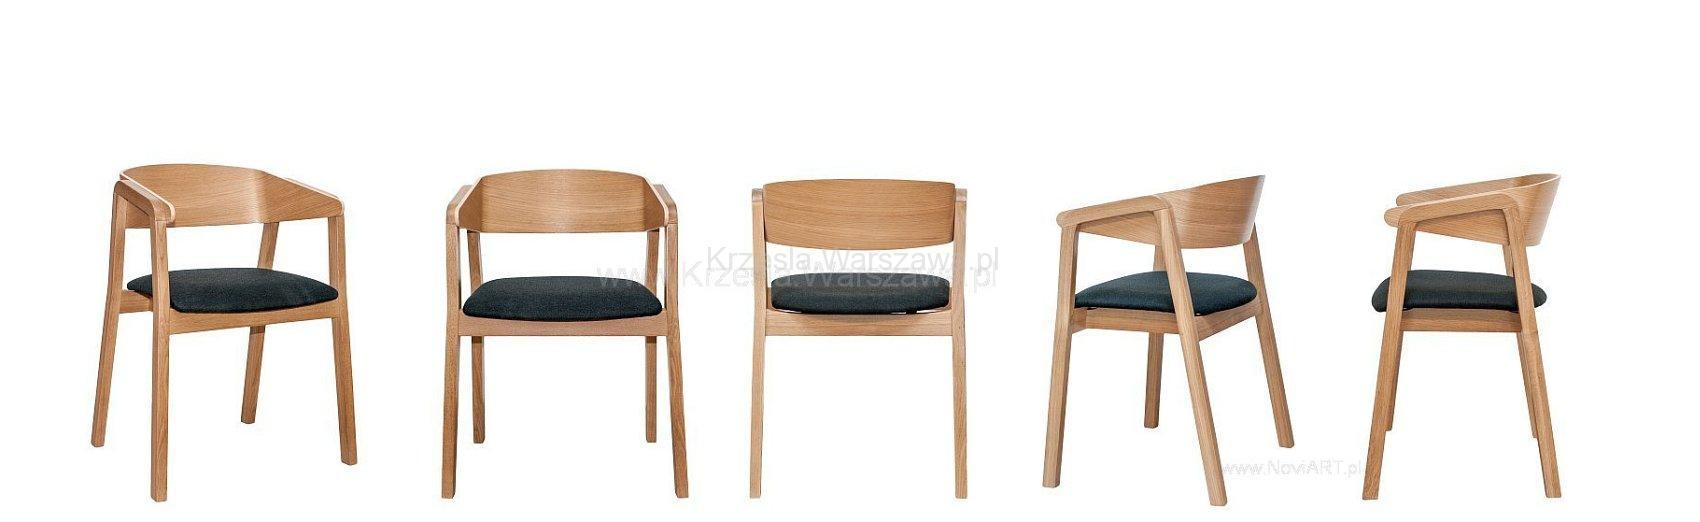 fotele-debowe-cava-lite-drewno